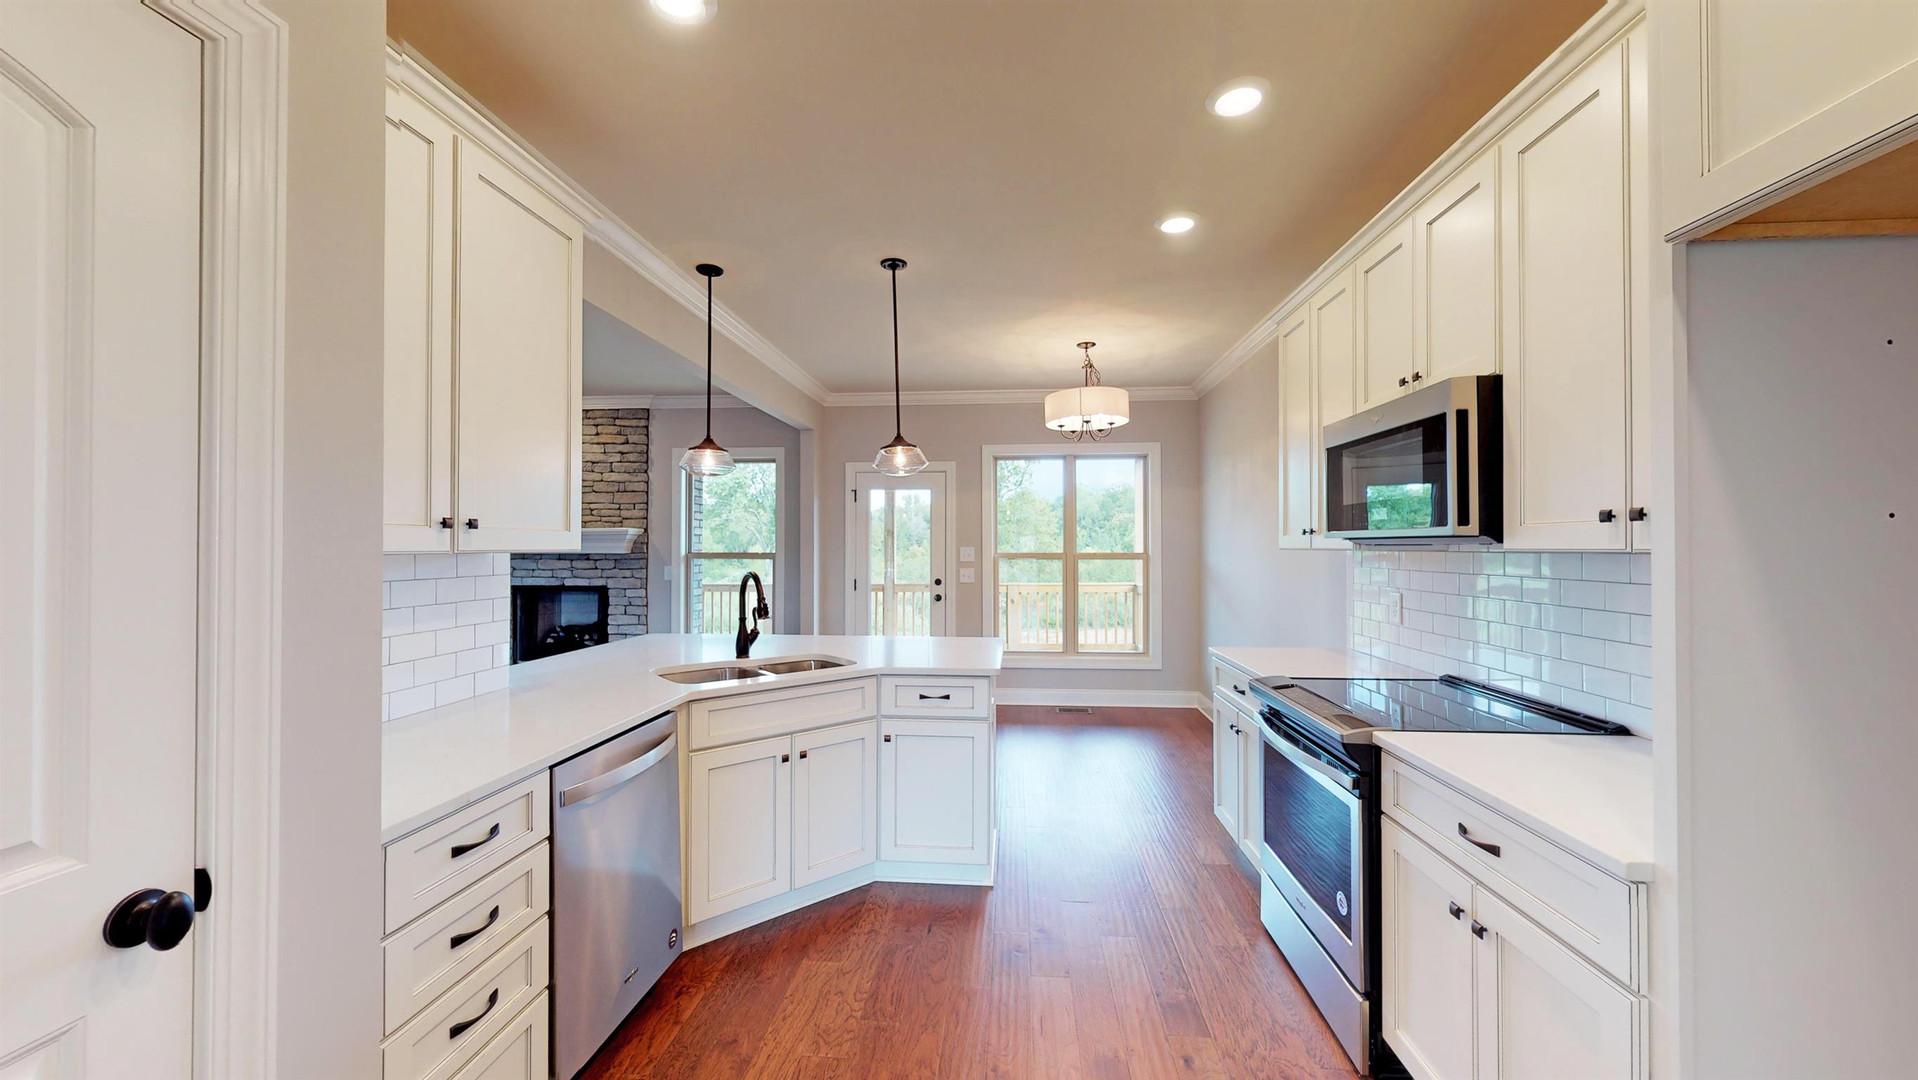 The Bouldercrest Kitchen & Breakfast Nook